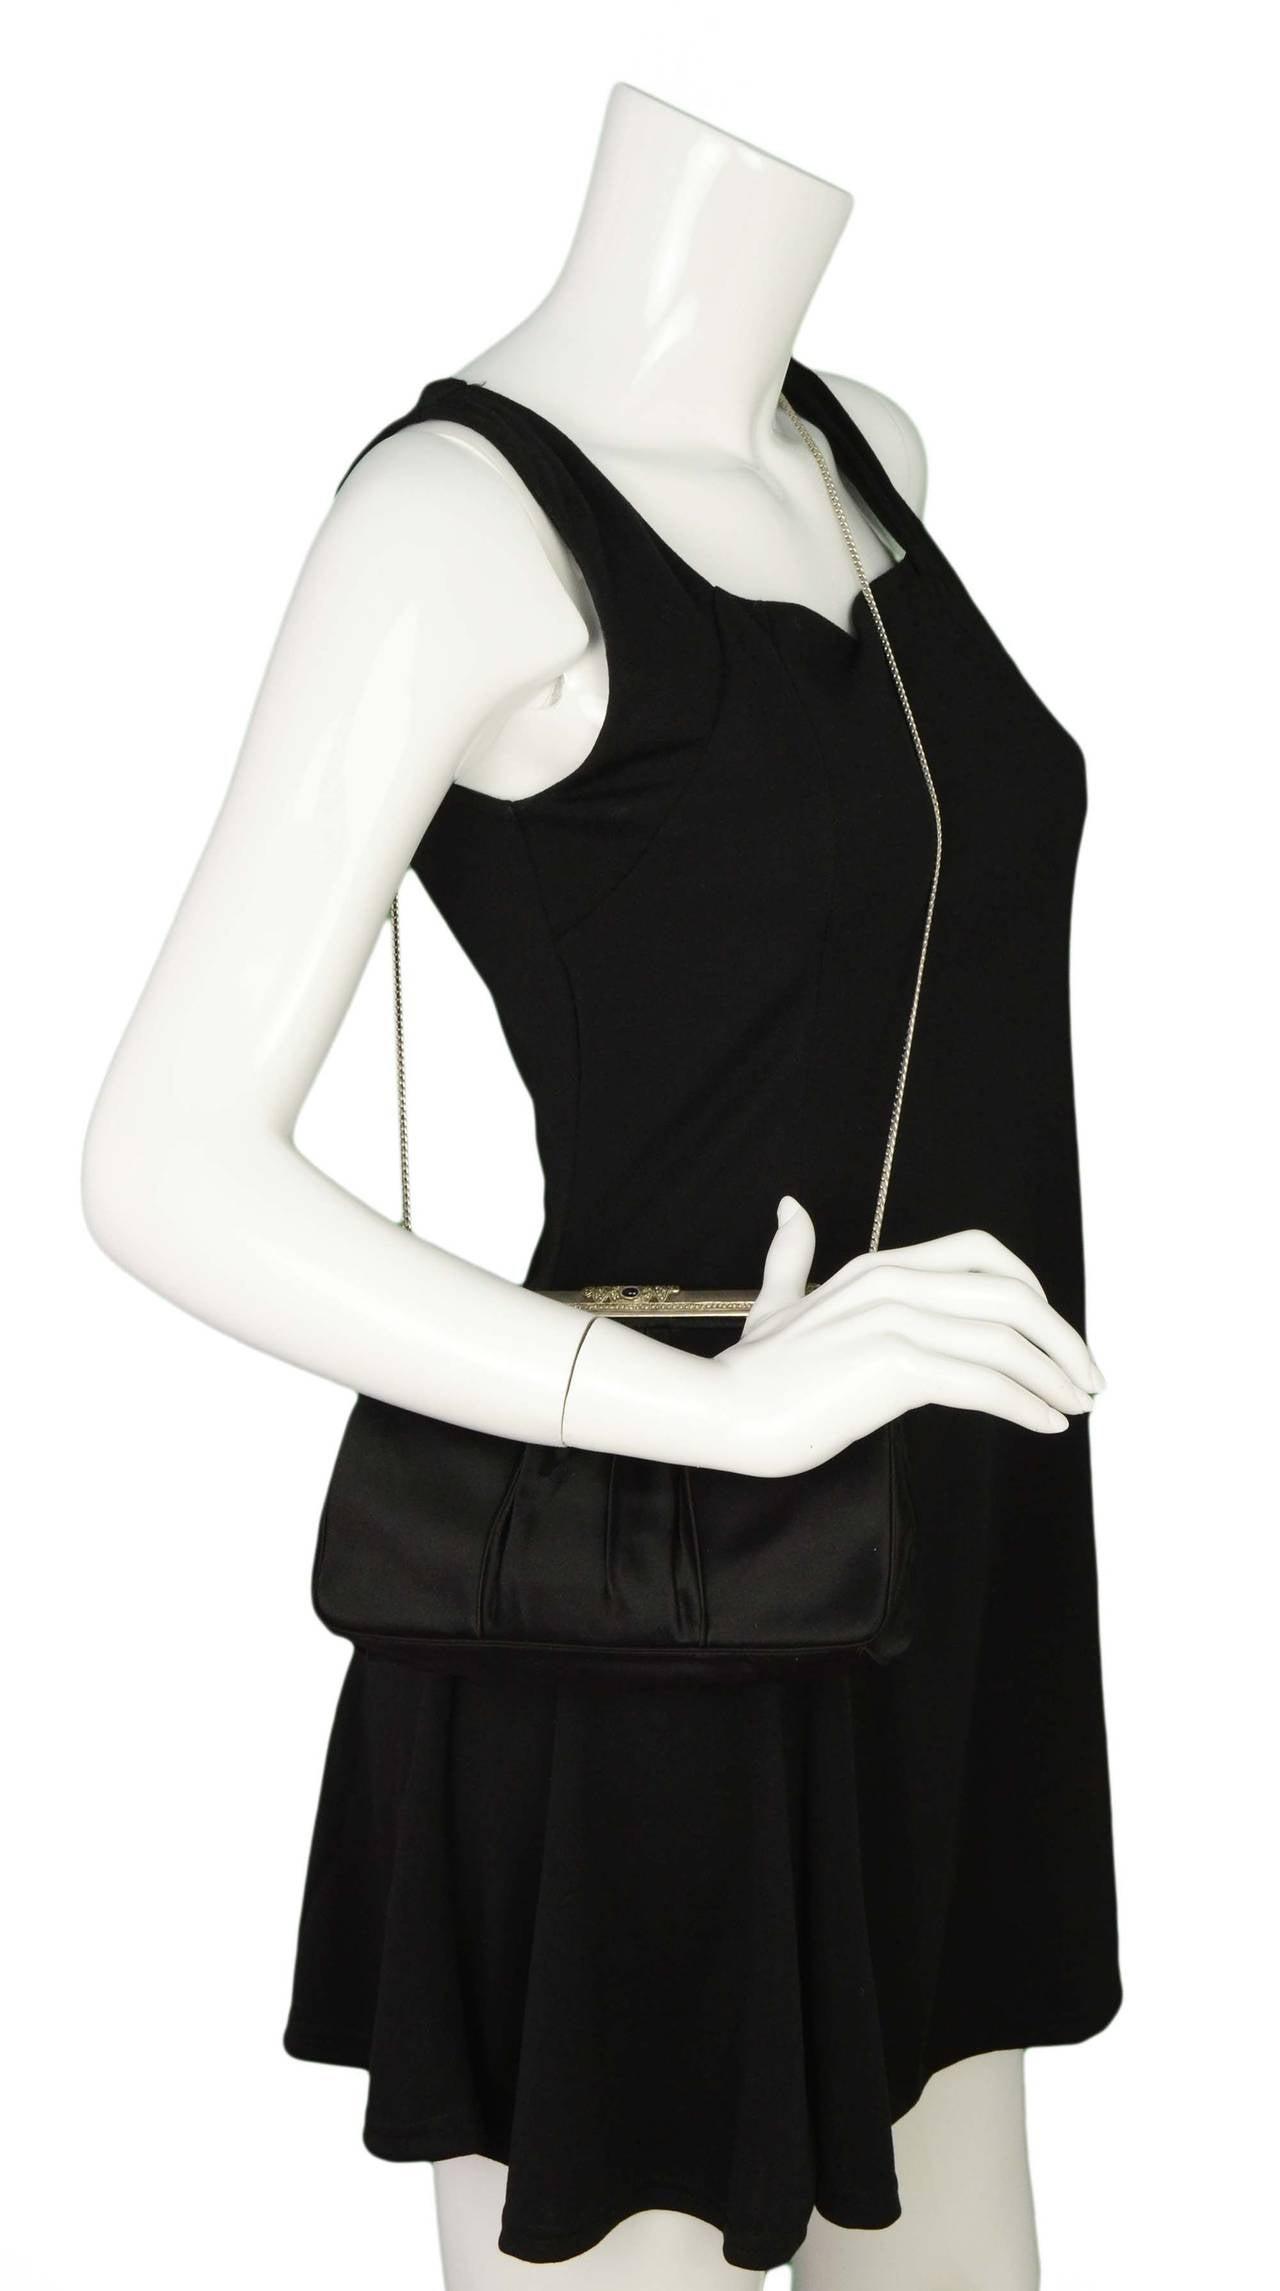 JUDITH LEIBER Black Satin Art Deco Evening Bag SHW 9